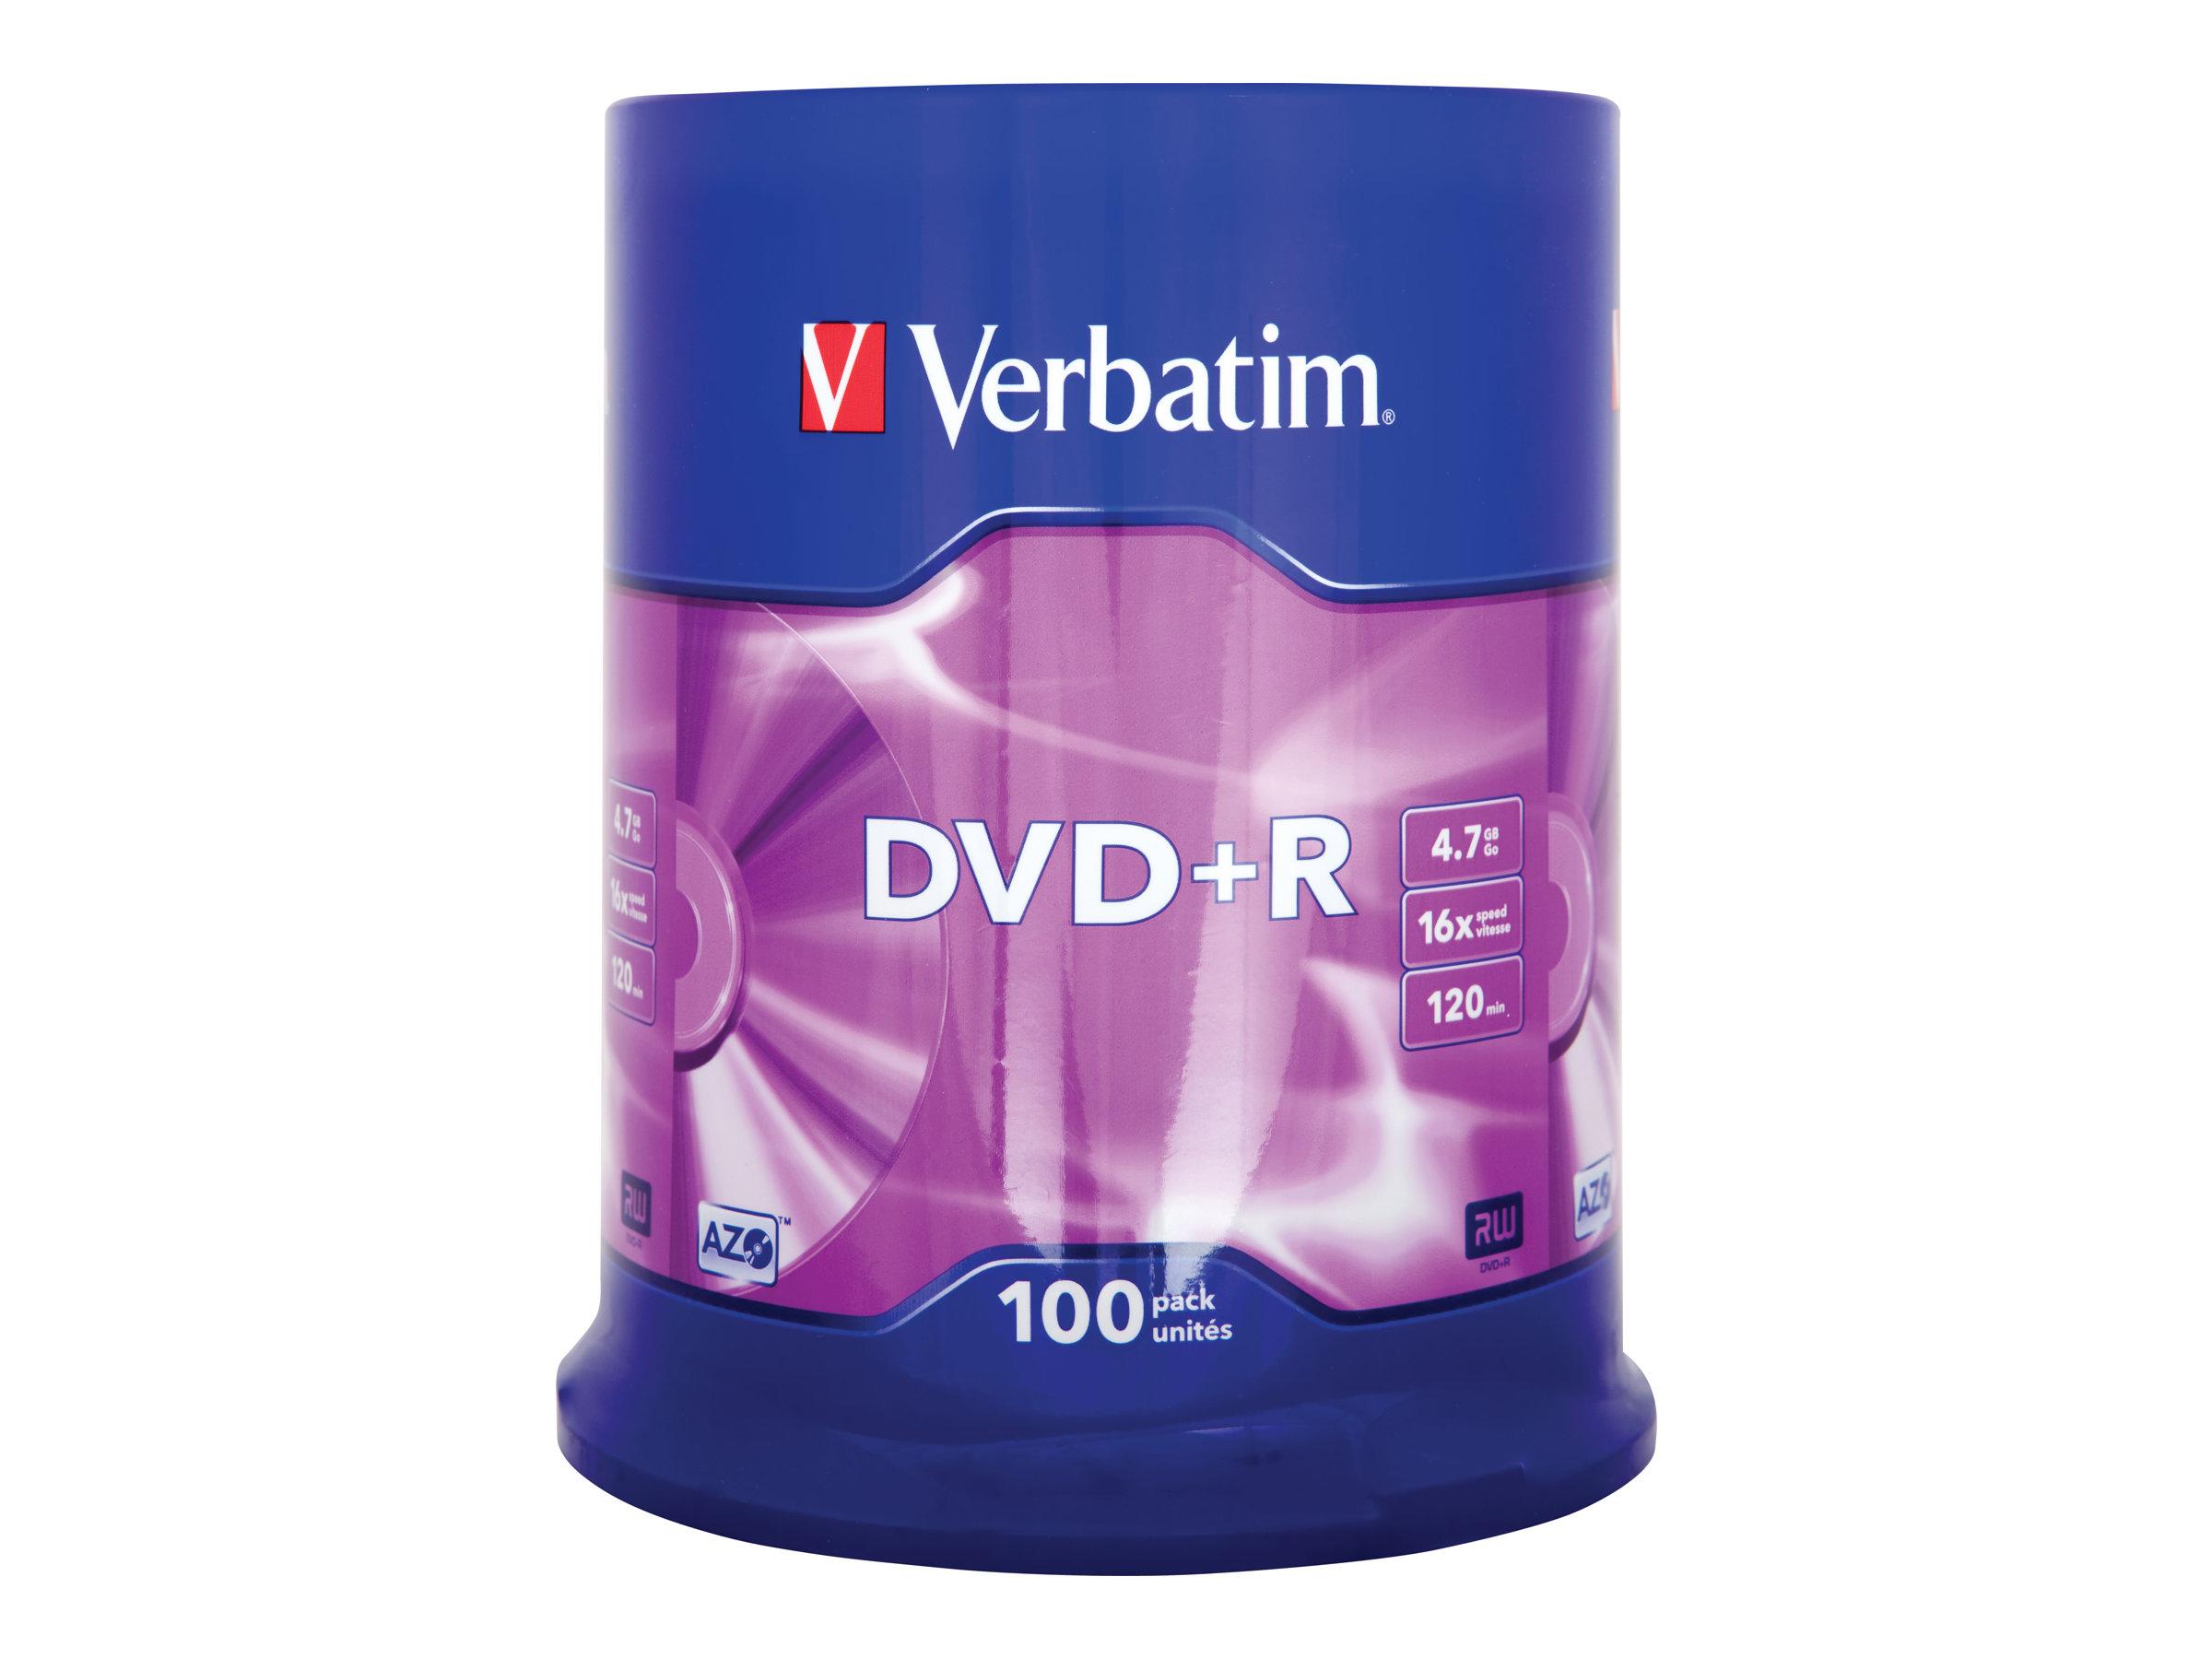 Verbatim - 100 x DVD+R - 4.7 GB 16x - mattes Silber - Spindel